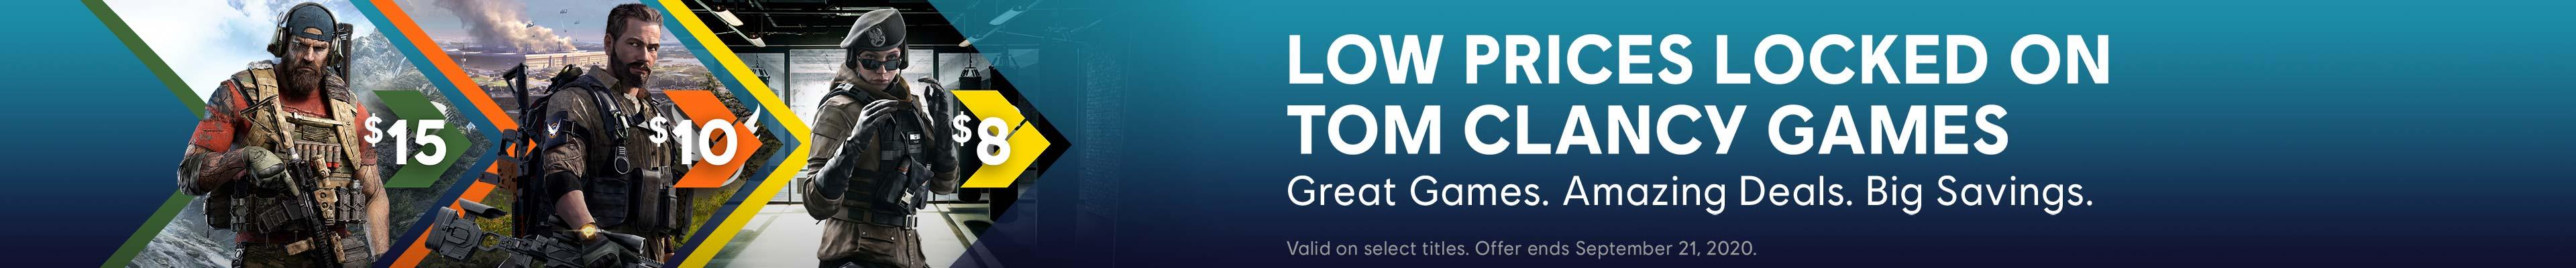 Tom Clancy Games on Sale